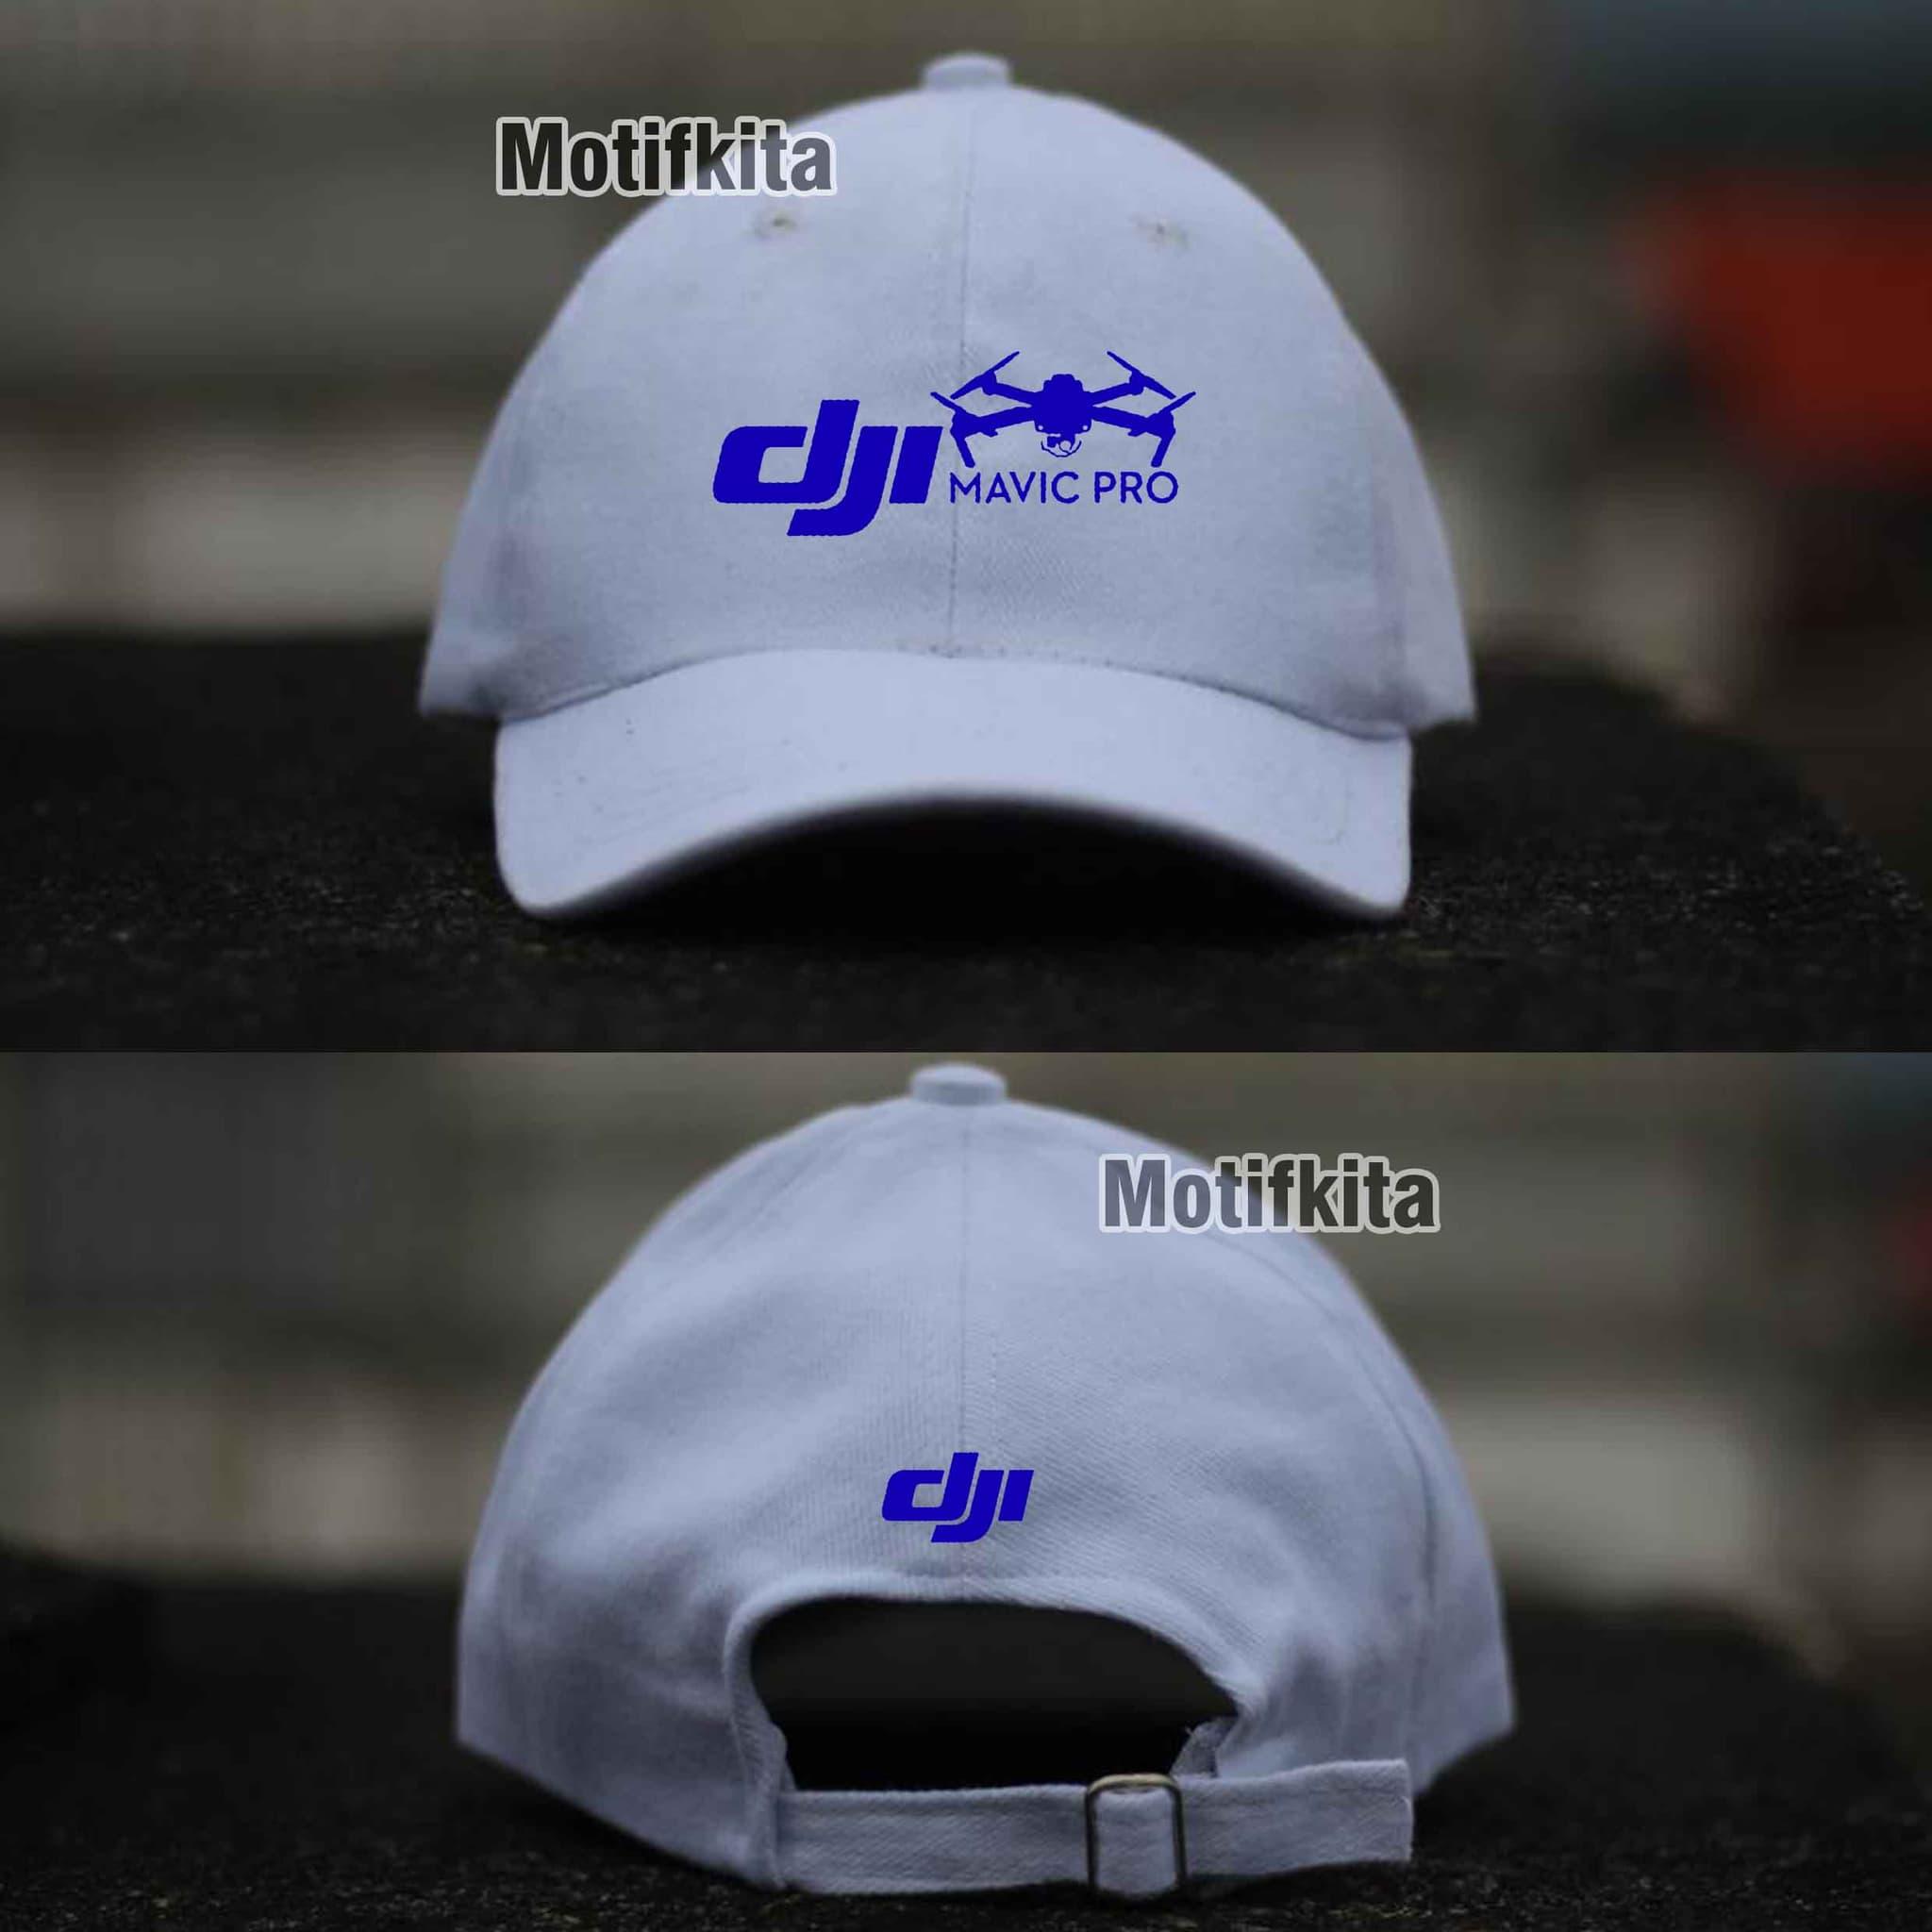 PENAWARAN Topi Baseball DJI MAVIC PRO putih keren Costumerch bcd63663bf